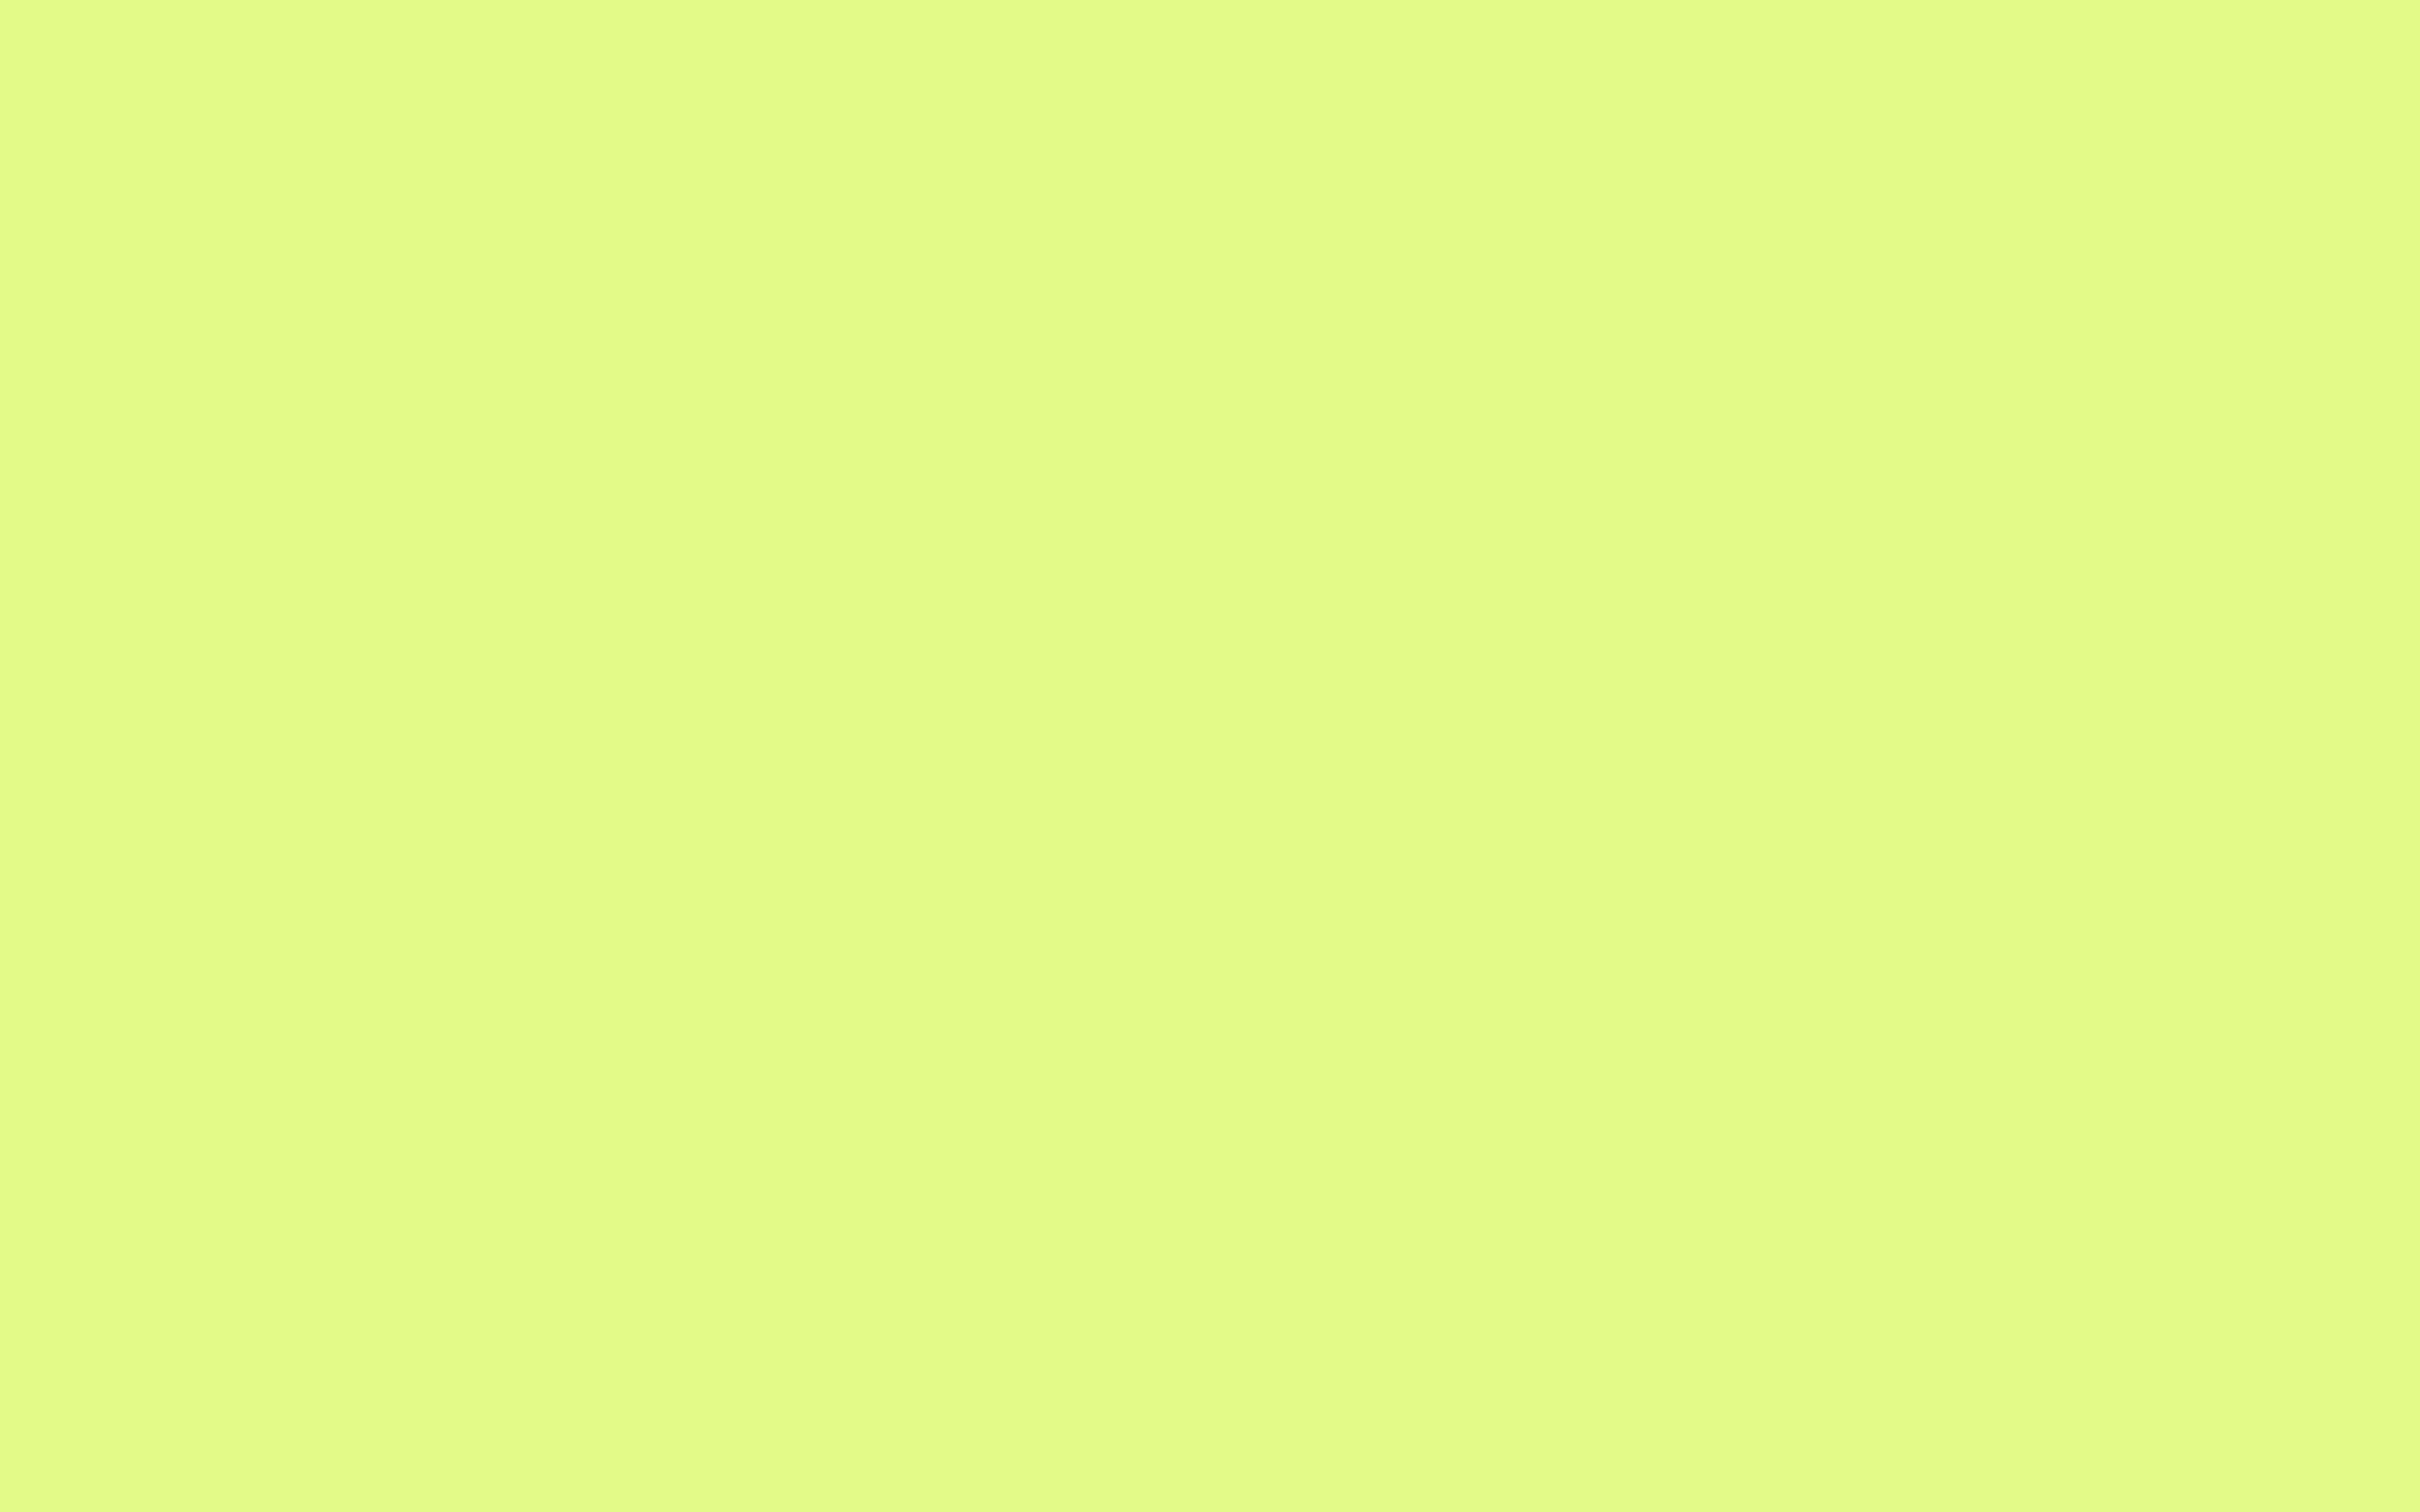 2560x1600 Midori Solid Color Background